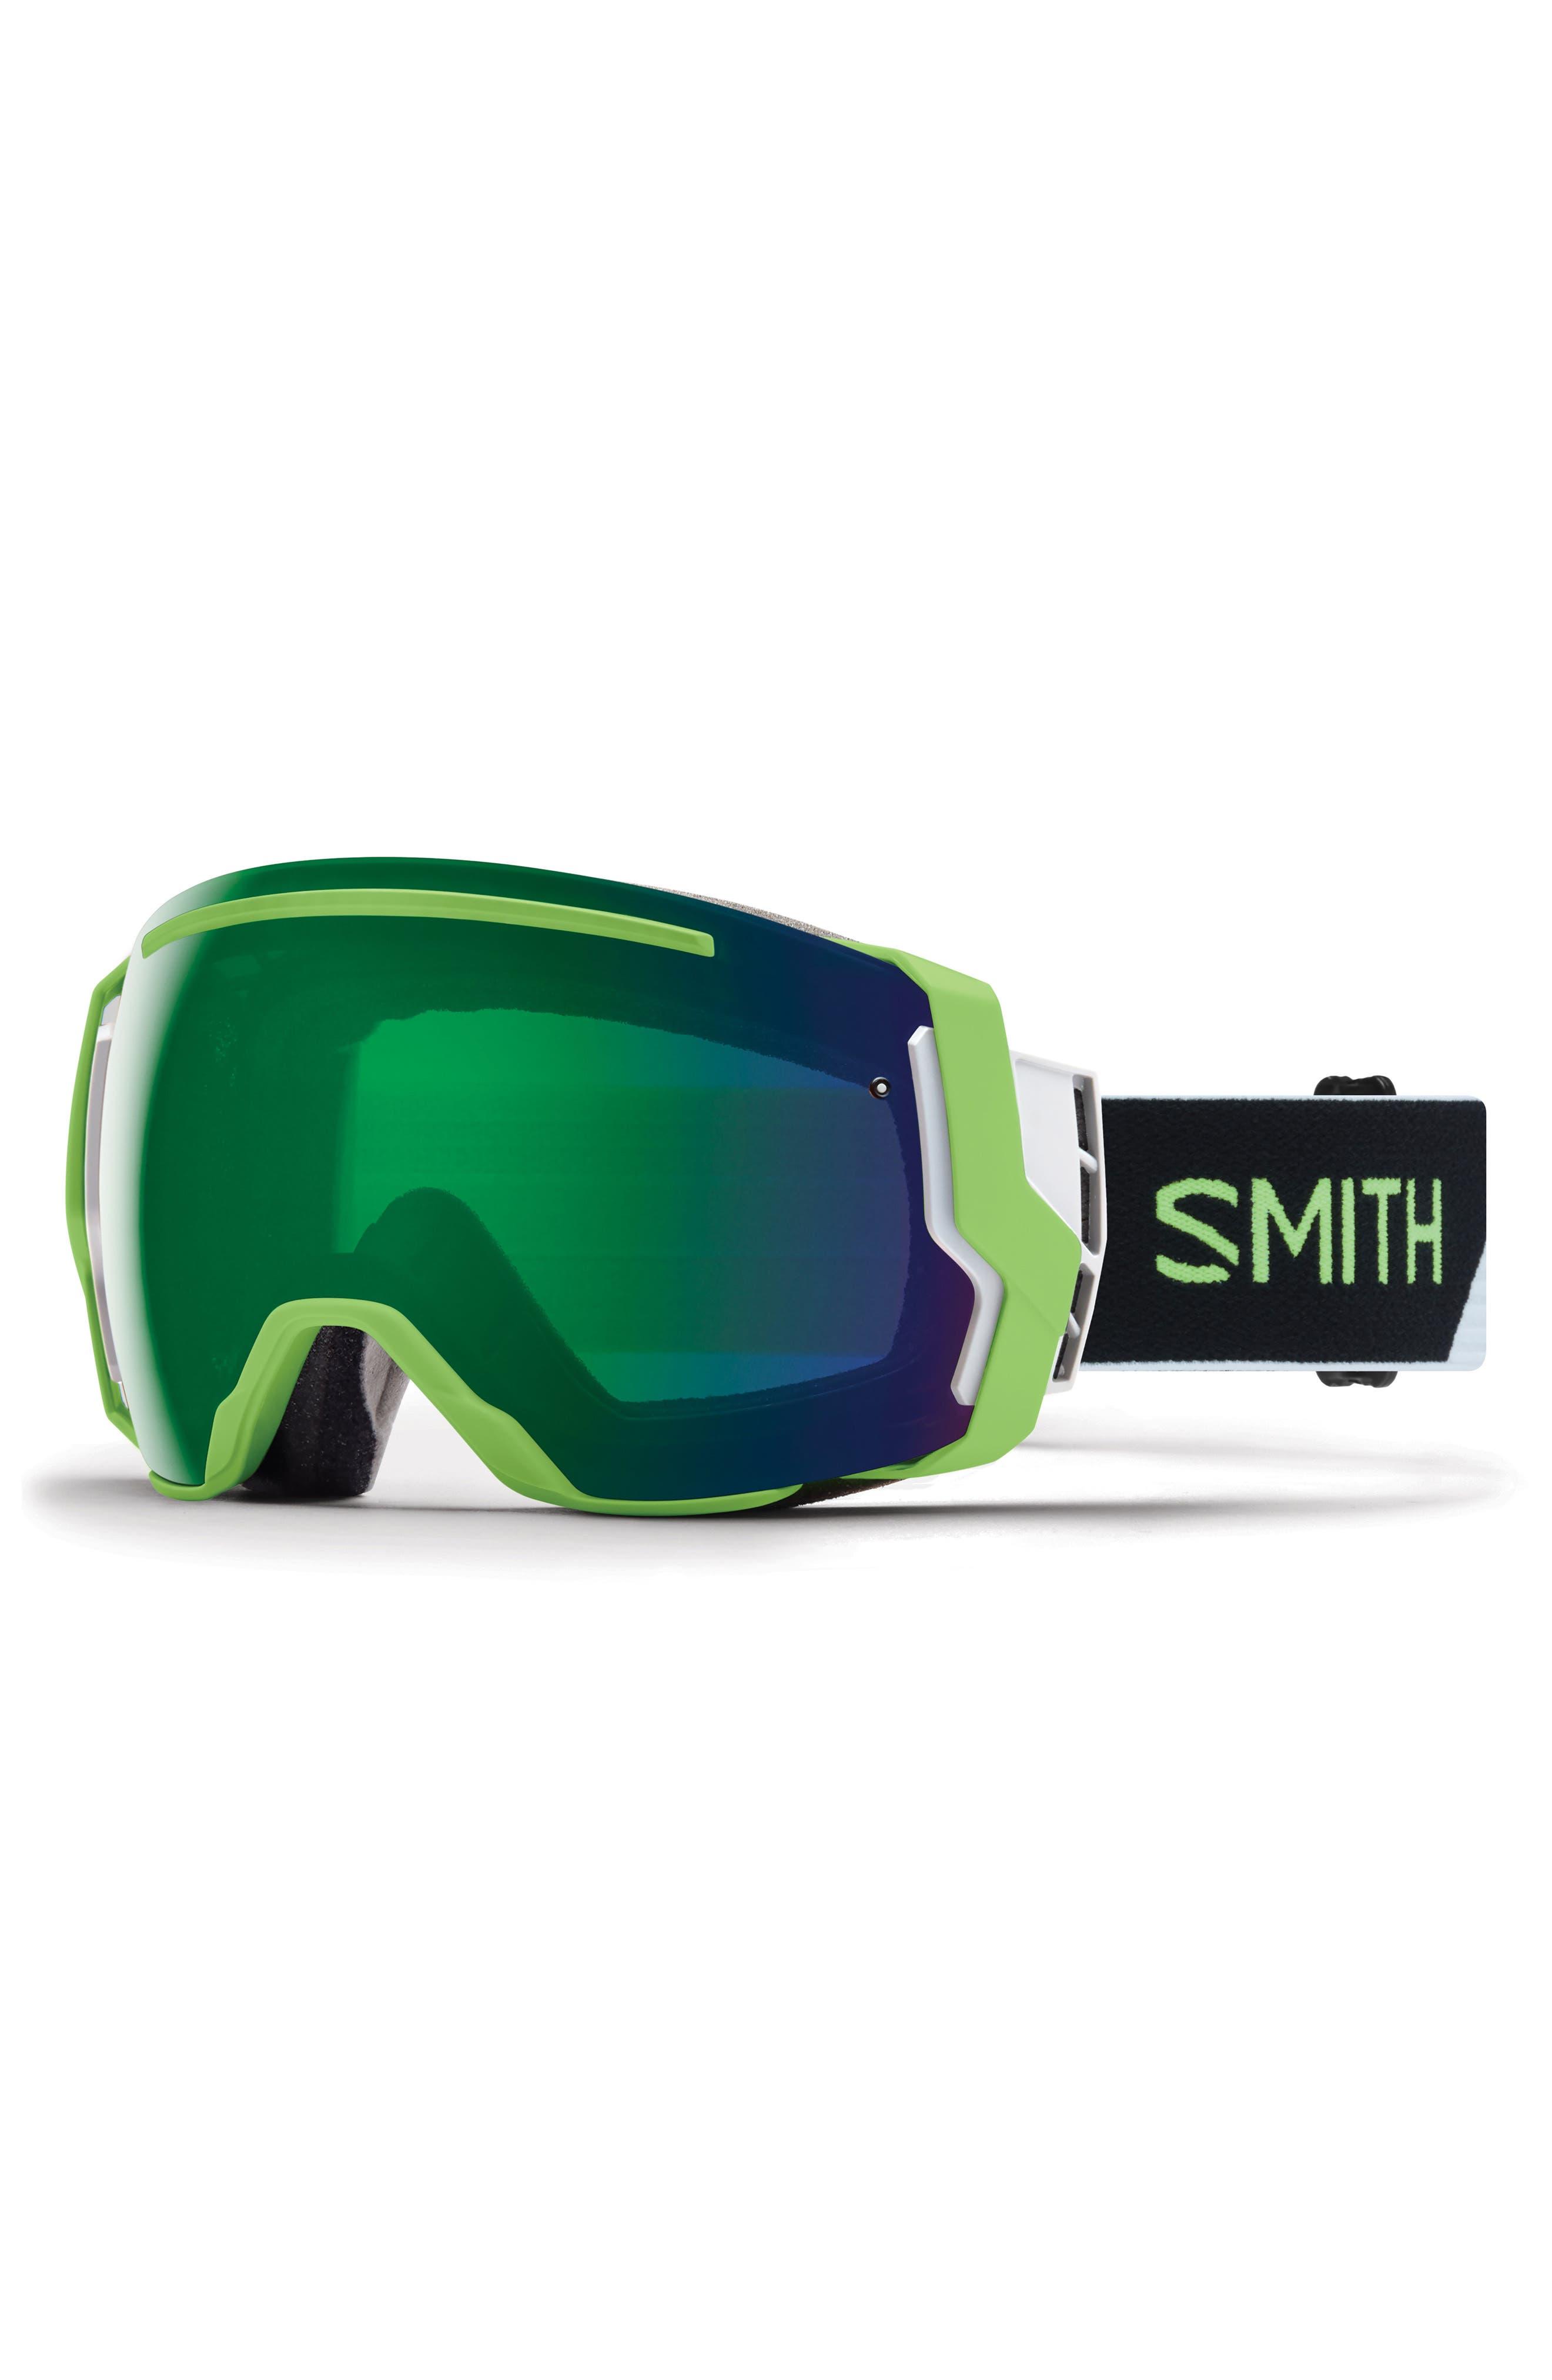 Alternate Image 1 Selected - Smith I/O7 Chromapop 185mm Snow Goggles